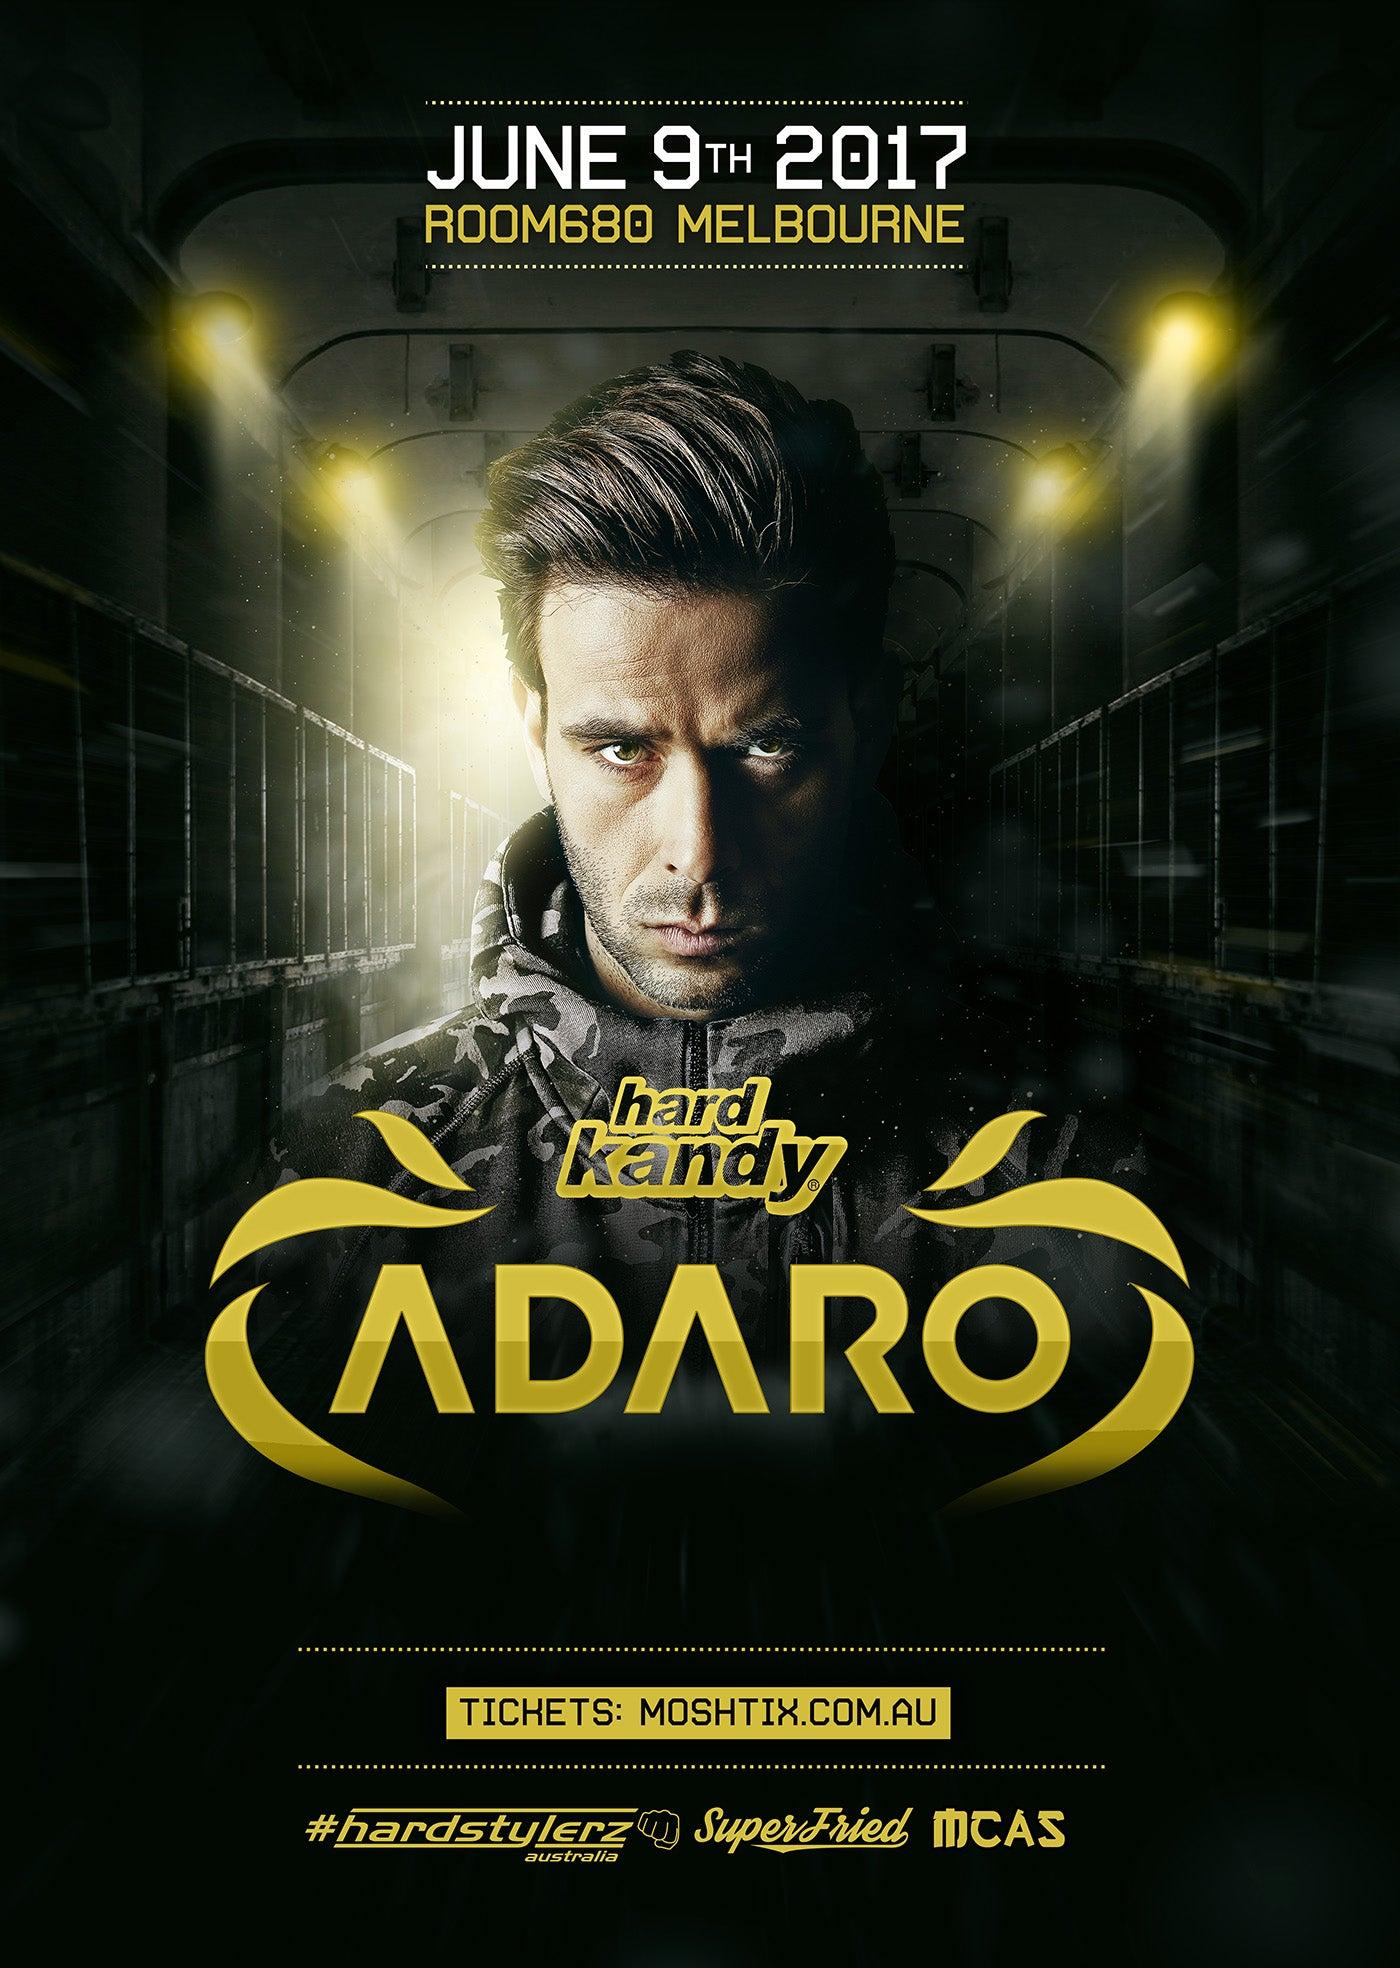 Adaro Tickets